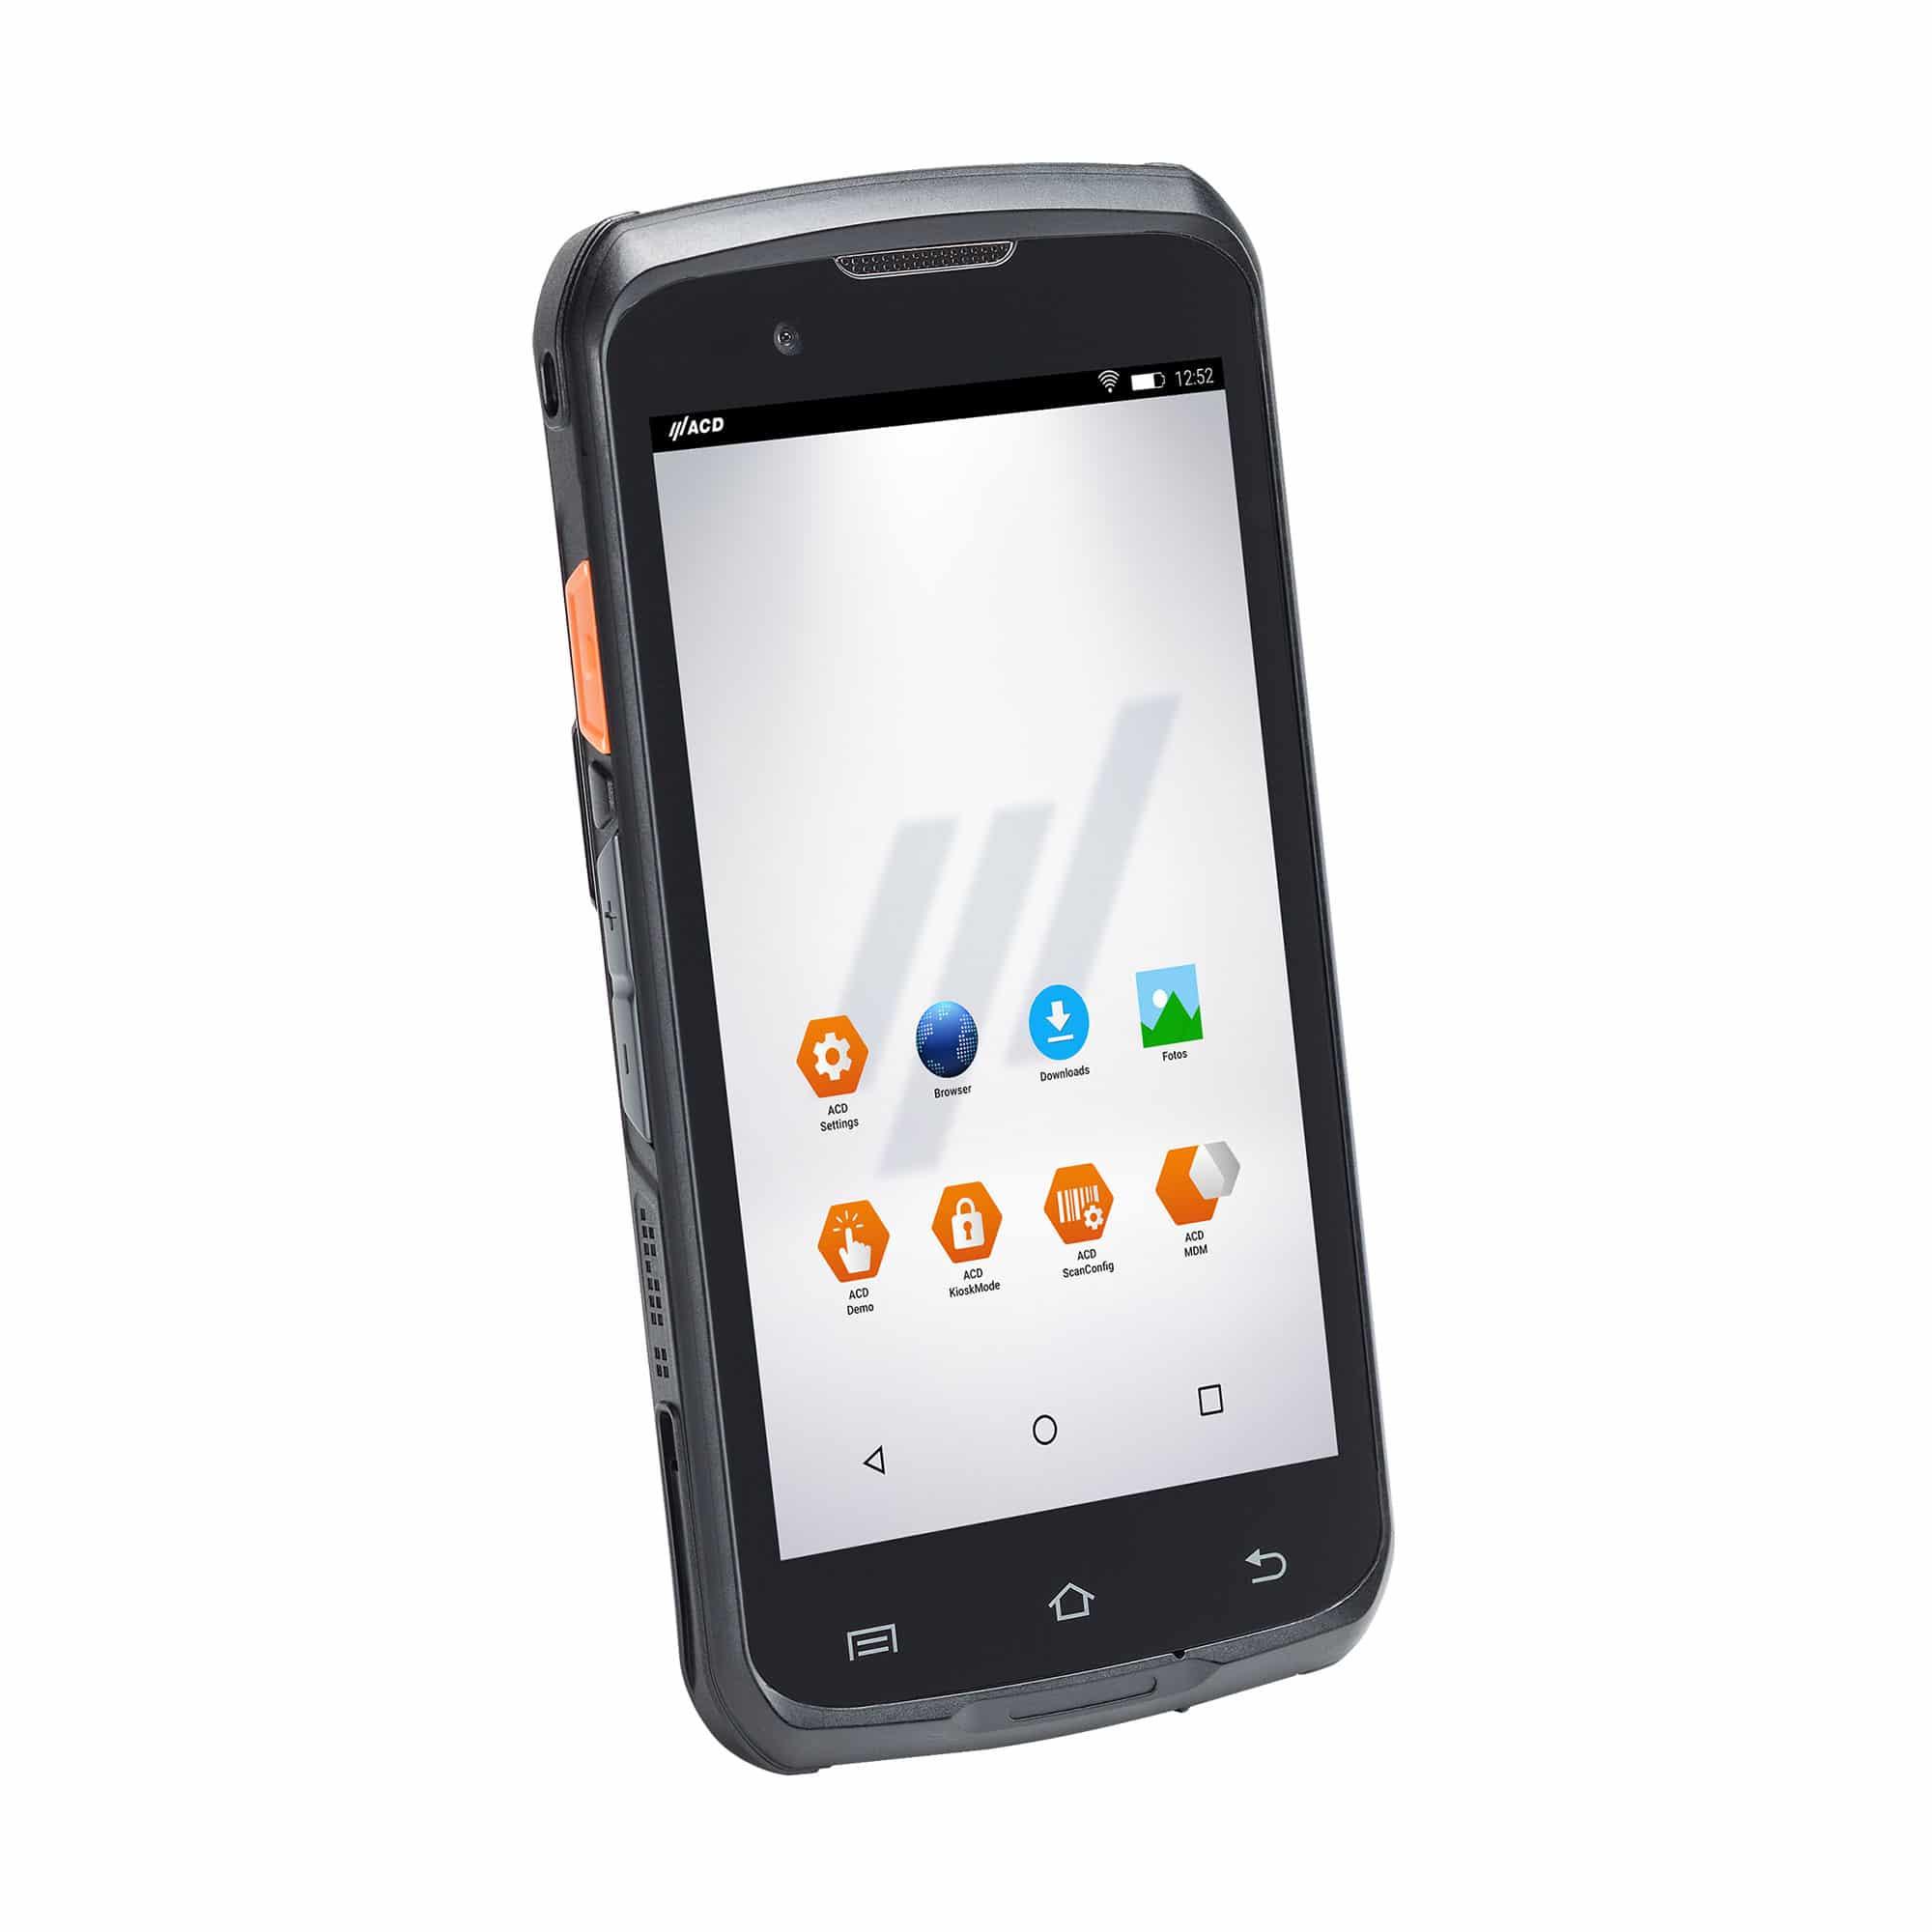 xt30 02 mobile geraete handheld computer